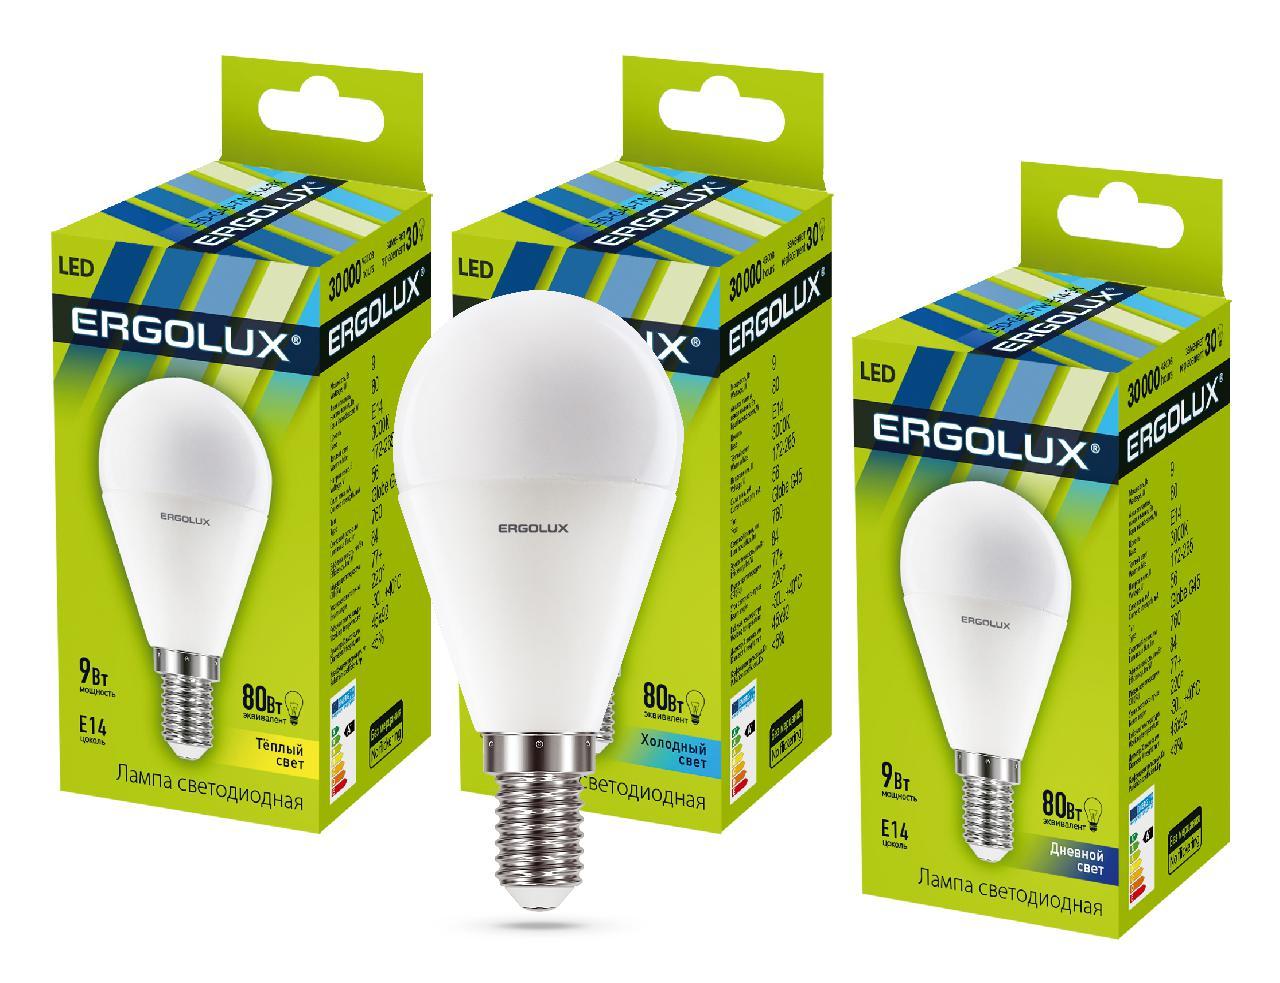 Лампа Ergolux Led-g45-9w-e14-4k